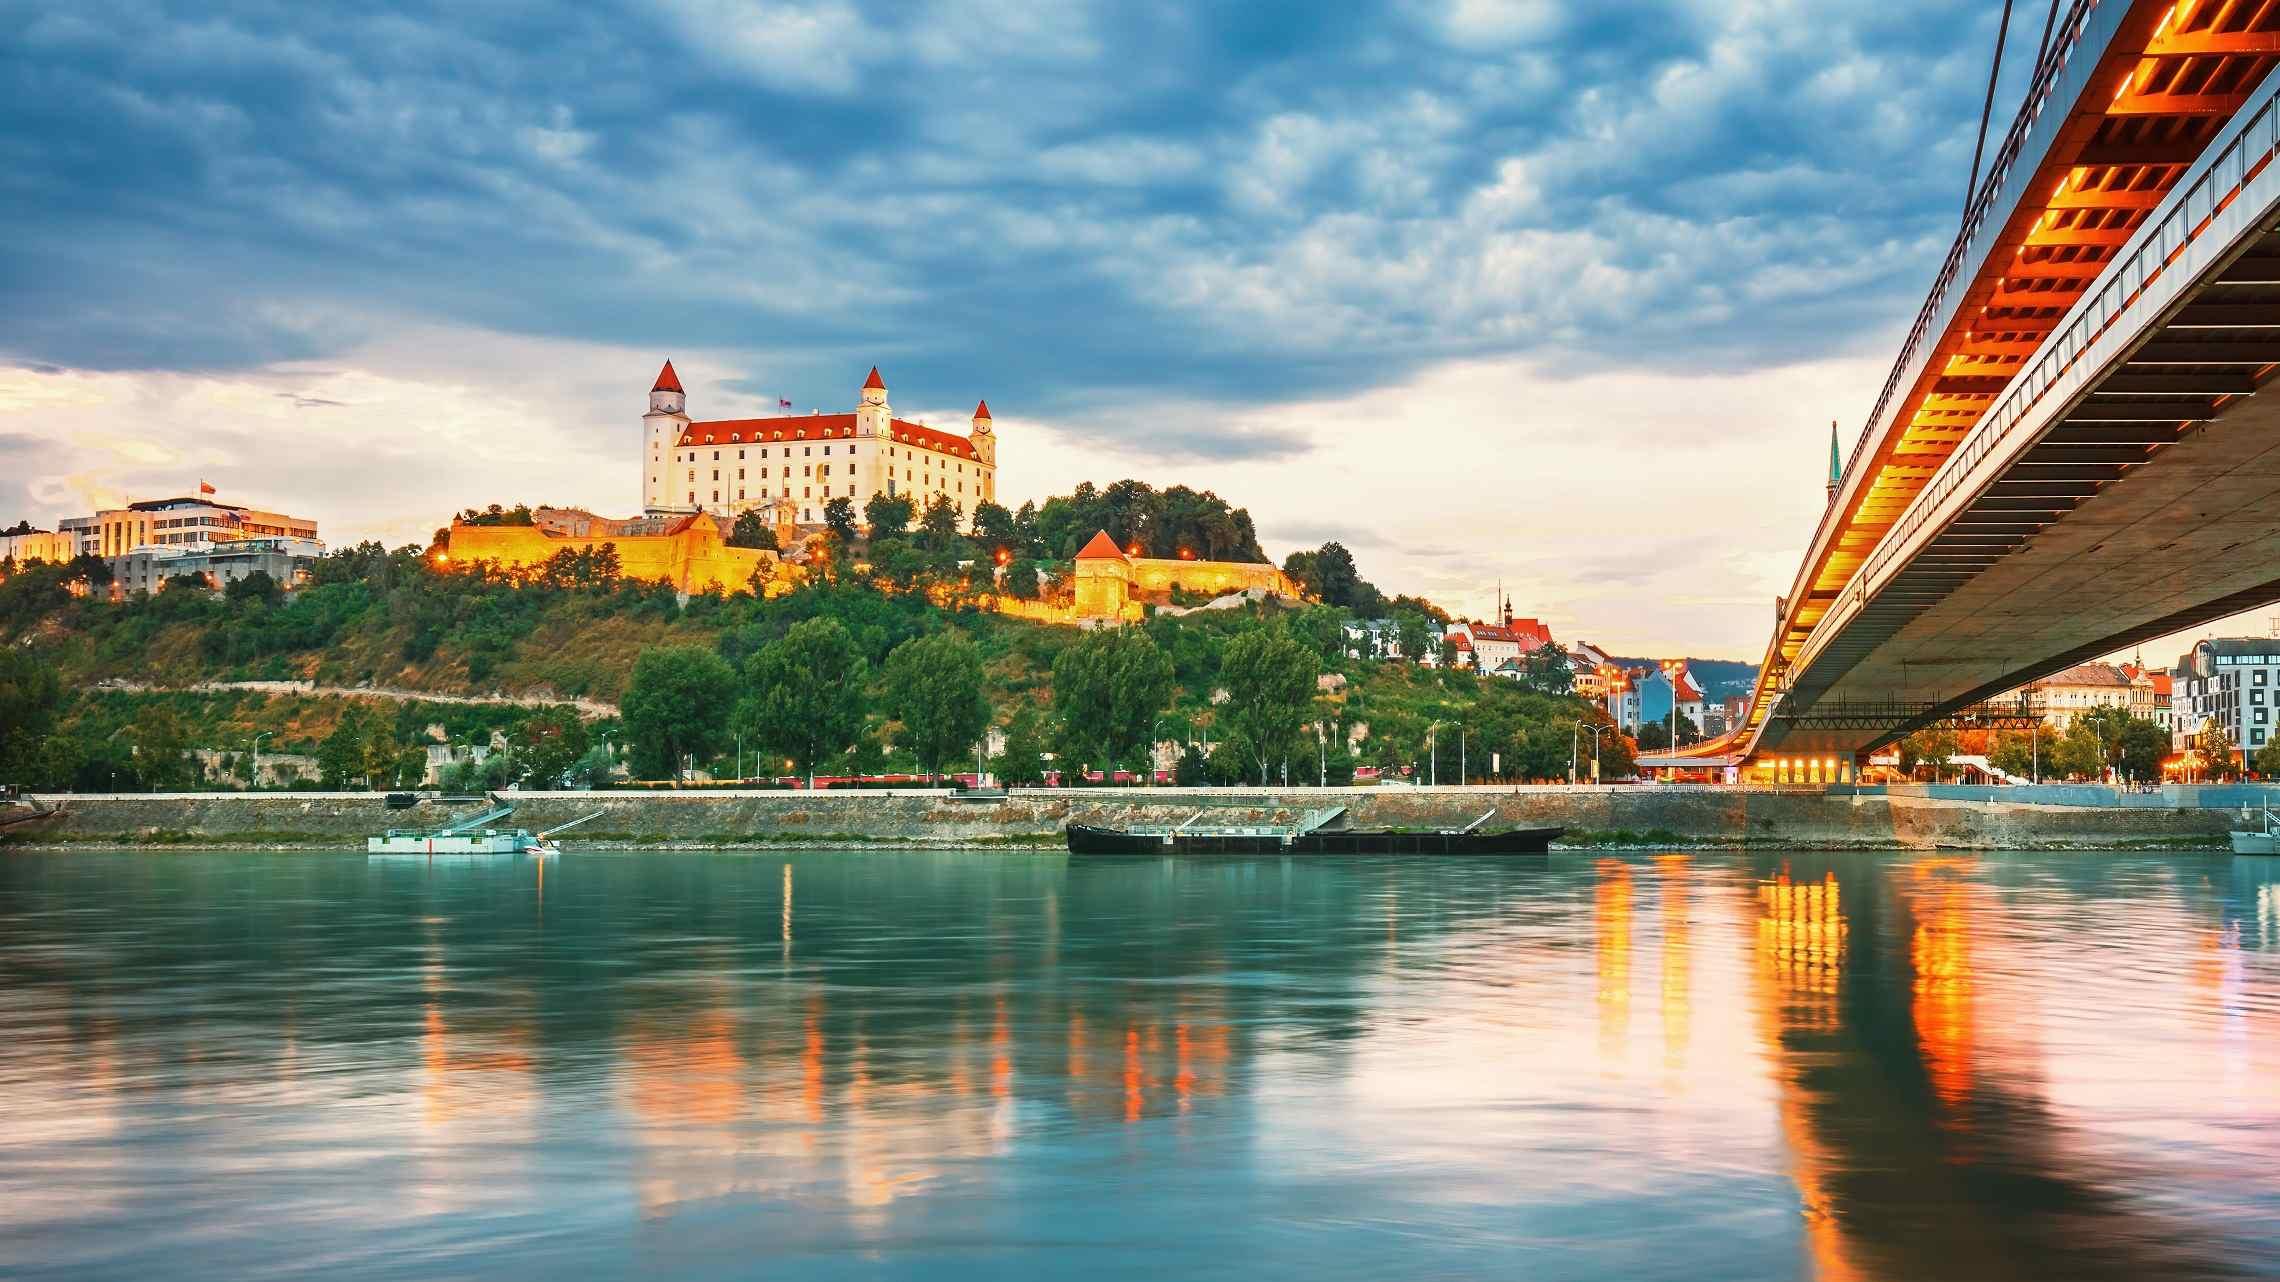 Bratislavan-linna-Slovakia-1920x1080.jpg